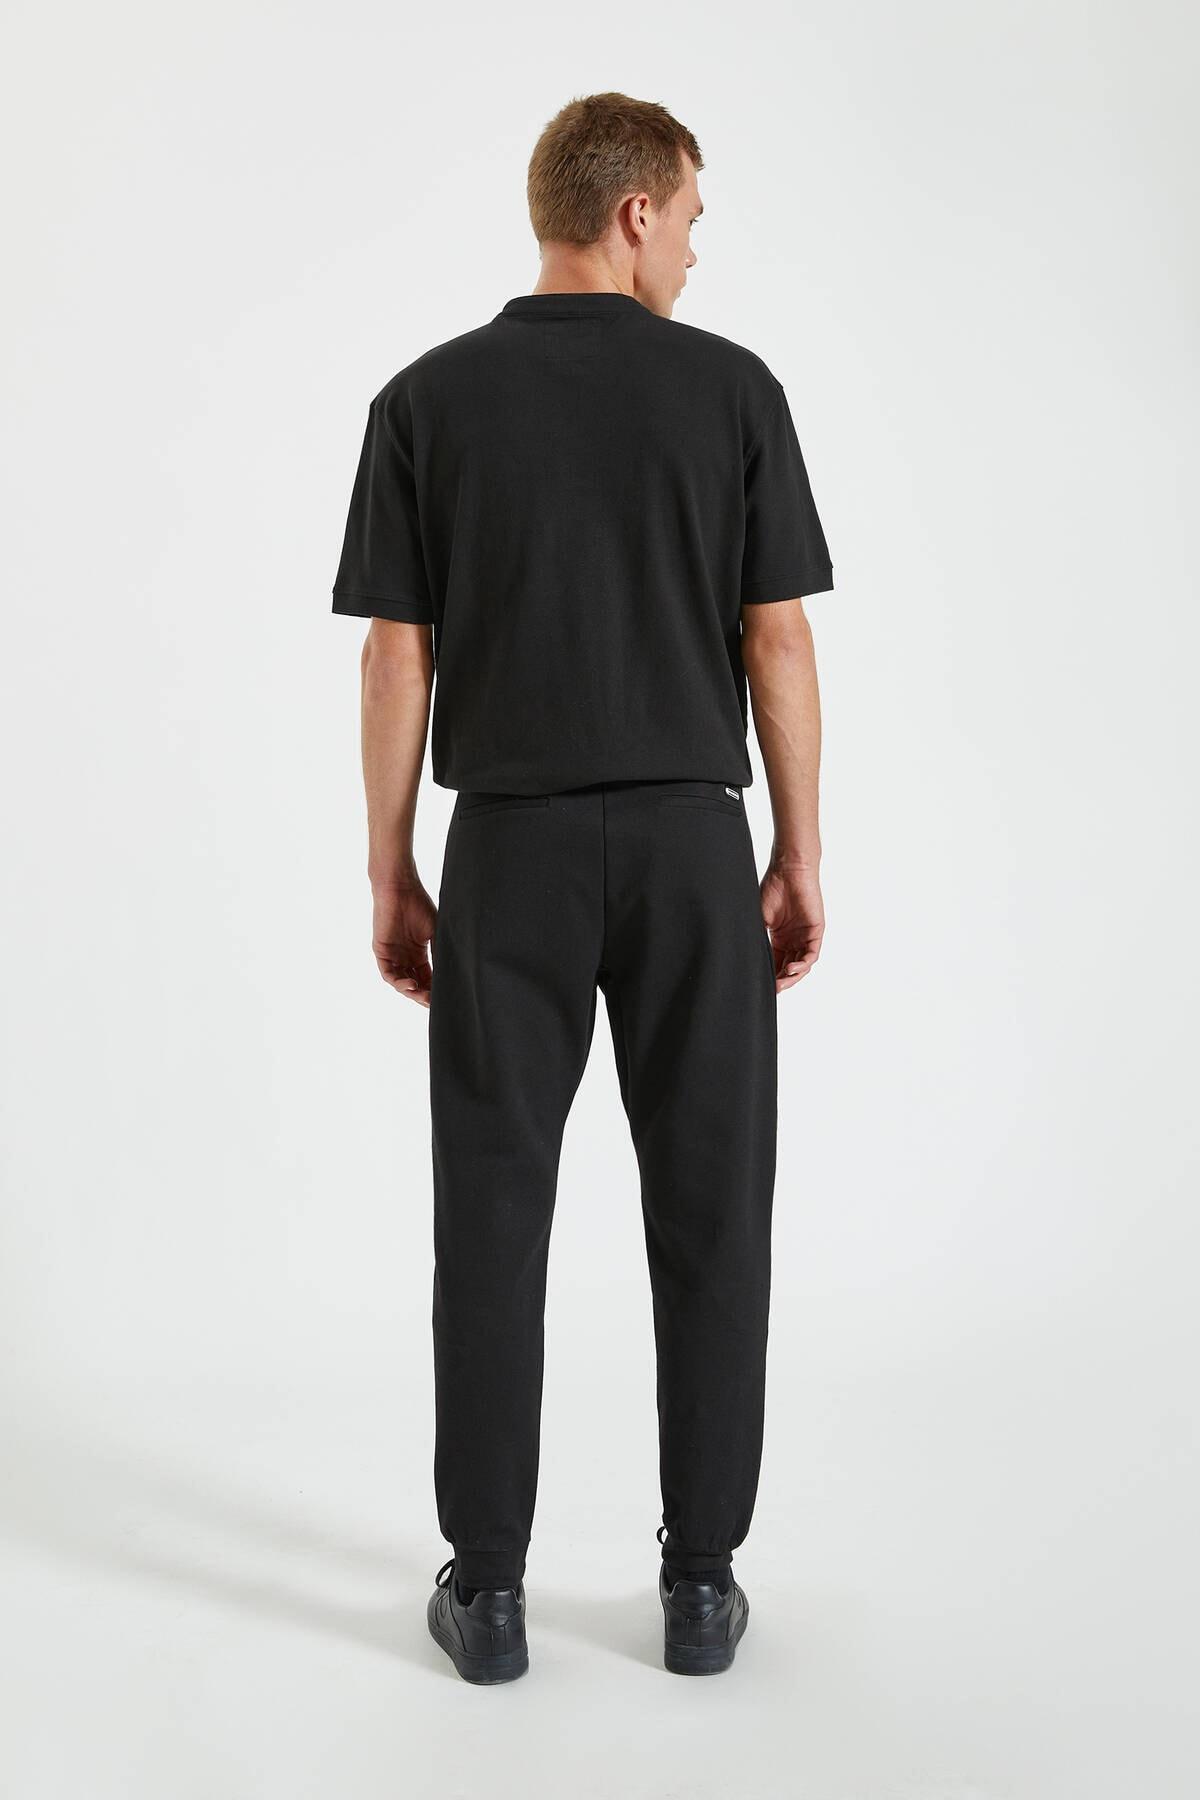 Pull & Bear Erkek Siyah Kontrast Fermuarlı Jogging Fit Pantolon 09678525 3